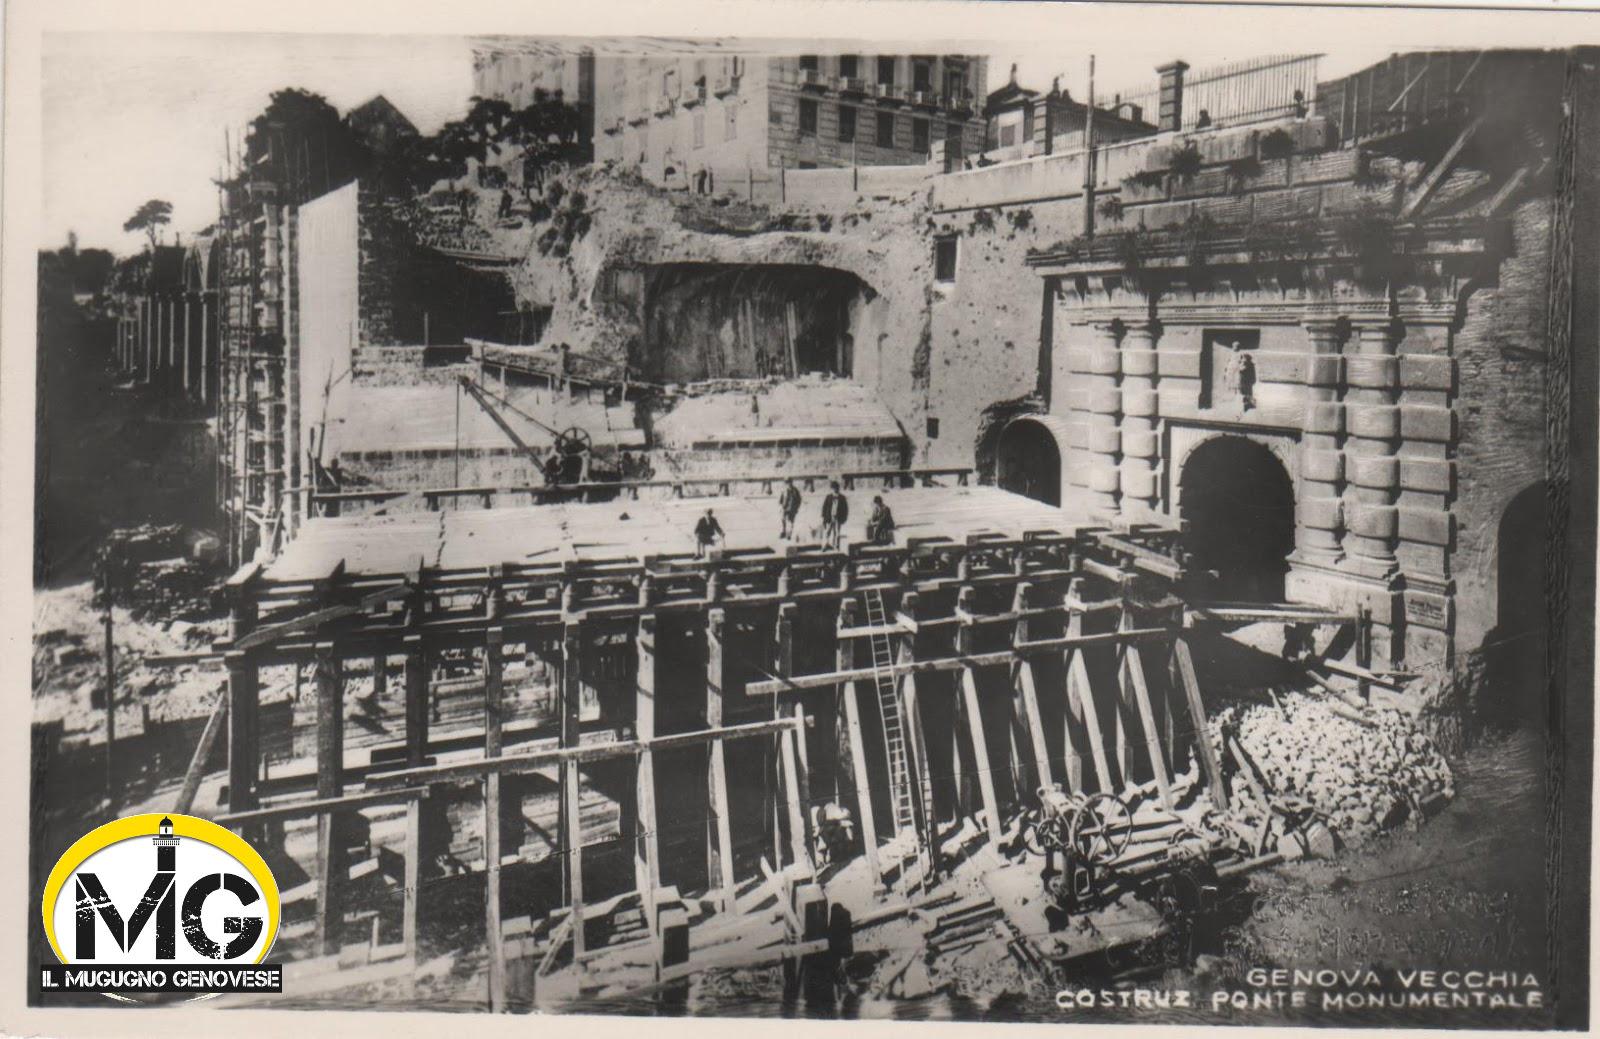 62 Ponte Monumentale in costruzione by Mangini